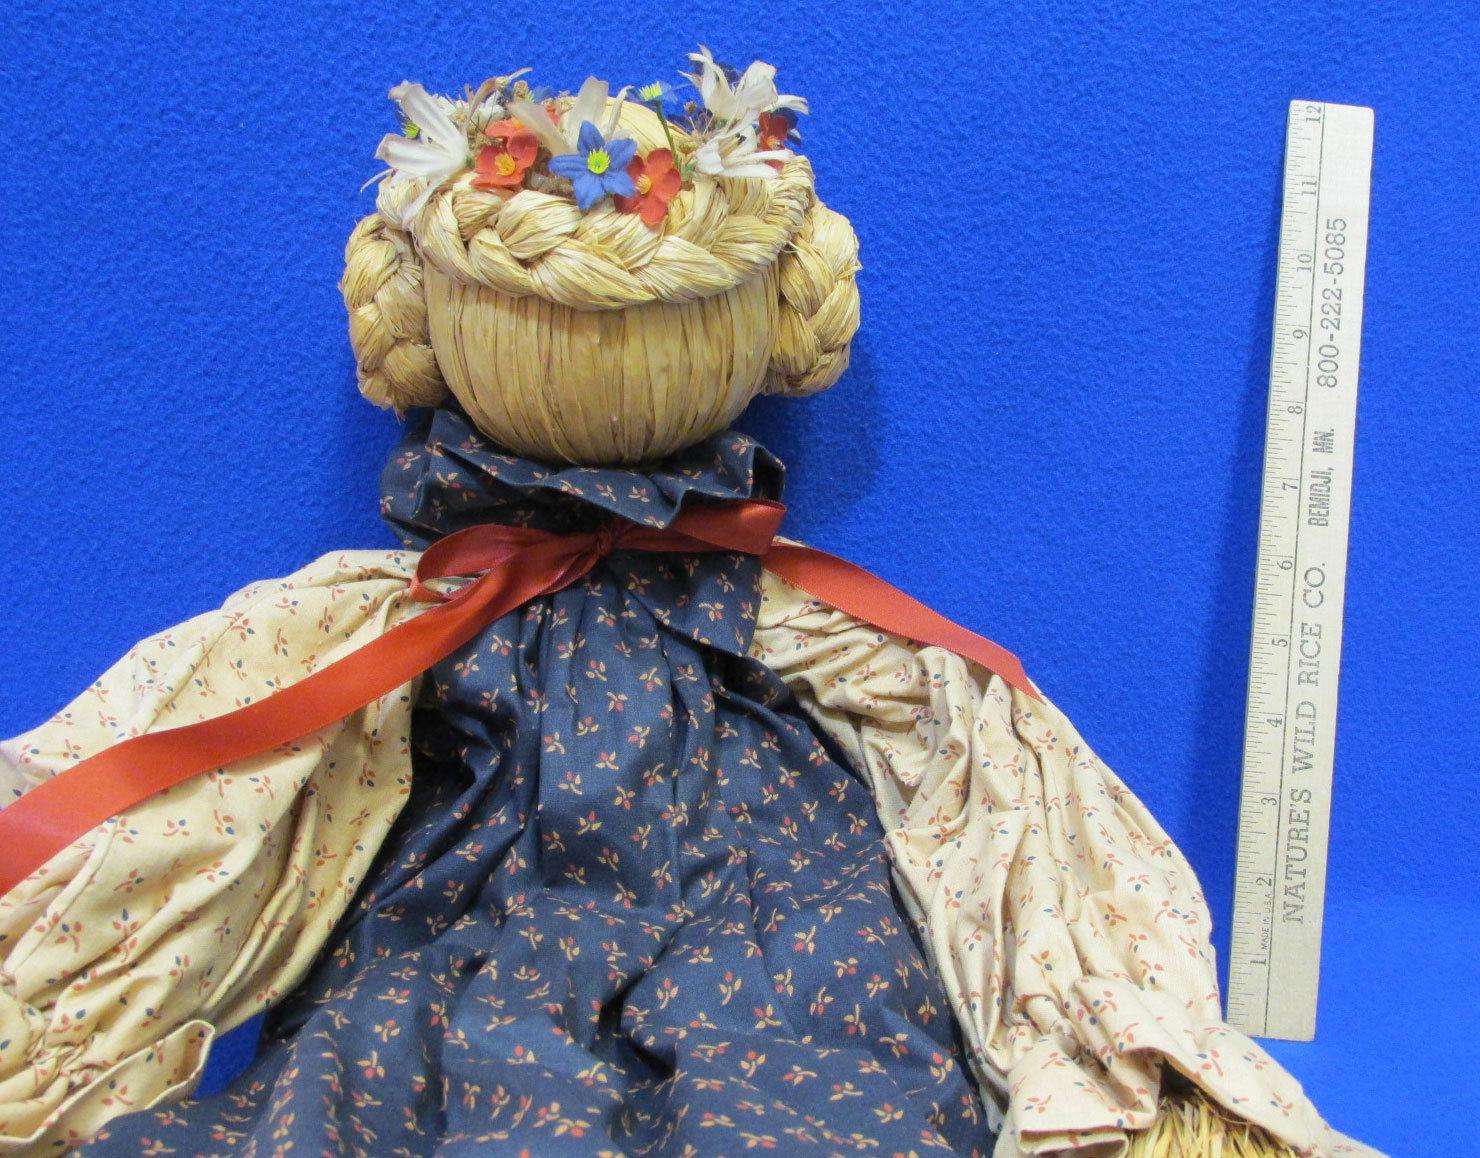 Vintage Handmade Straw Rag Doll Navy Blluw Tan Country Fabric Dress Straw Body